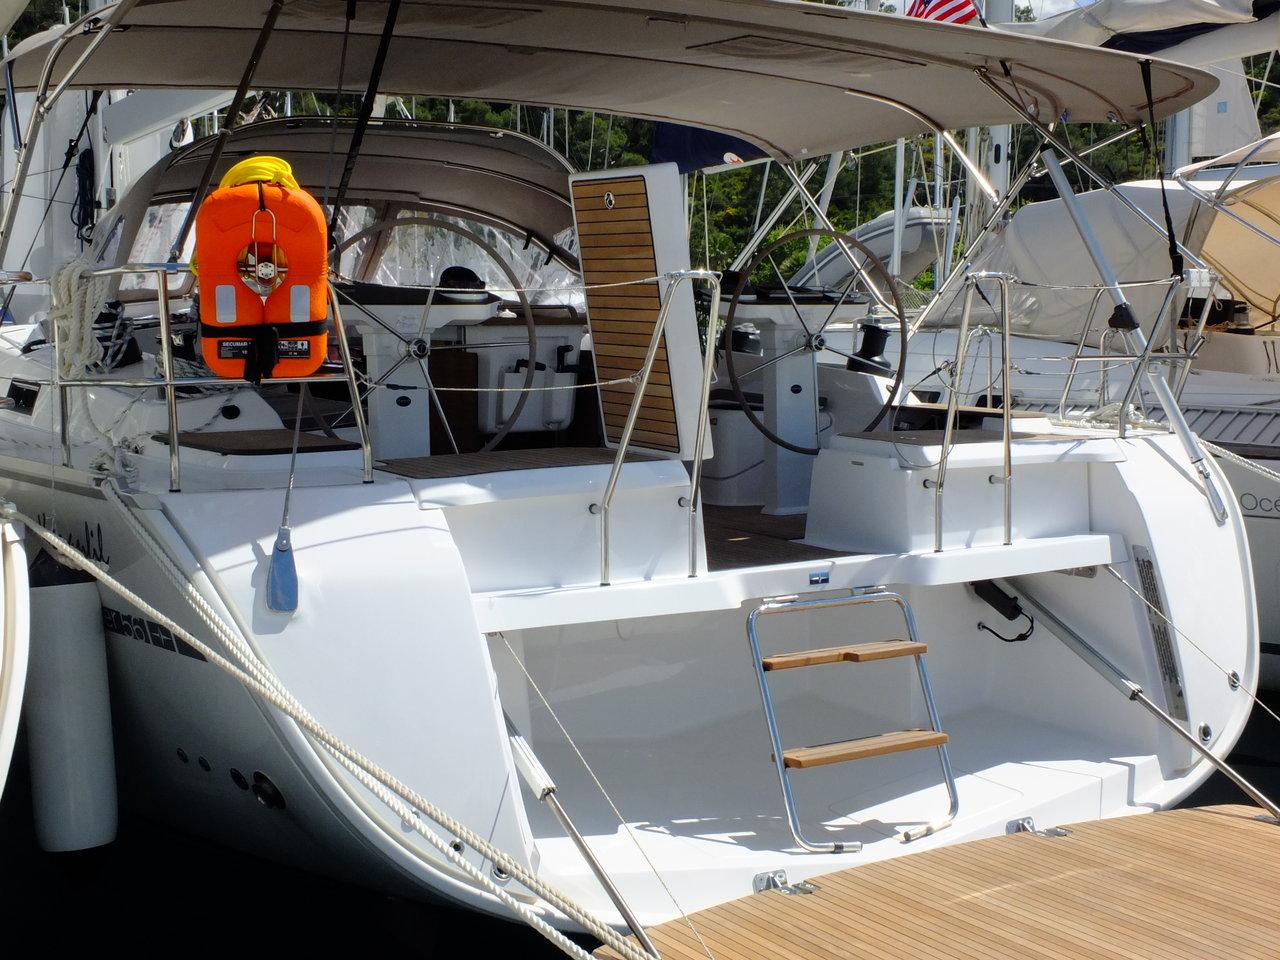 pitter yachting yachtcharter bavaria cruiser 56 breathless. Black Bedroom Furniture Sets. Home Design Ideas